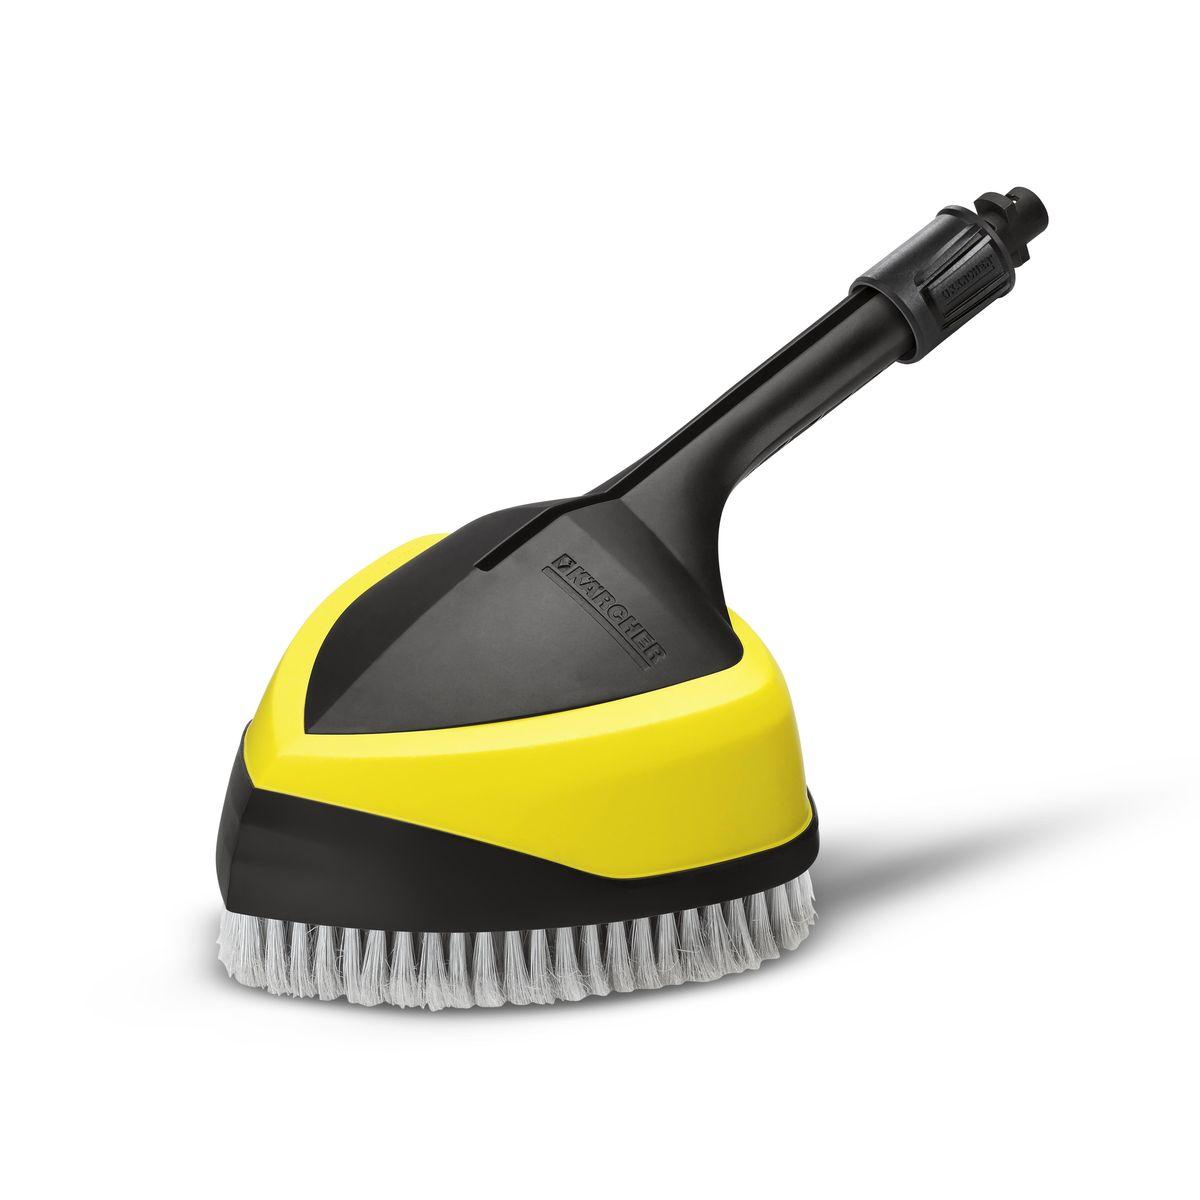 Щетка Karcher Power Brush WB 150 2.643-237.0